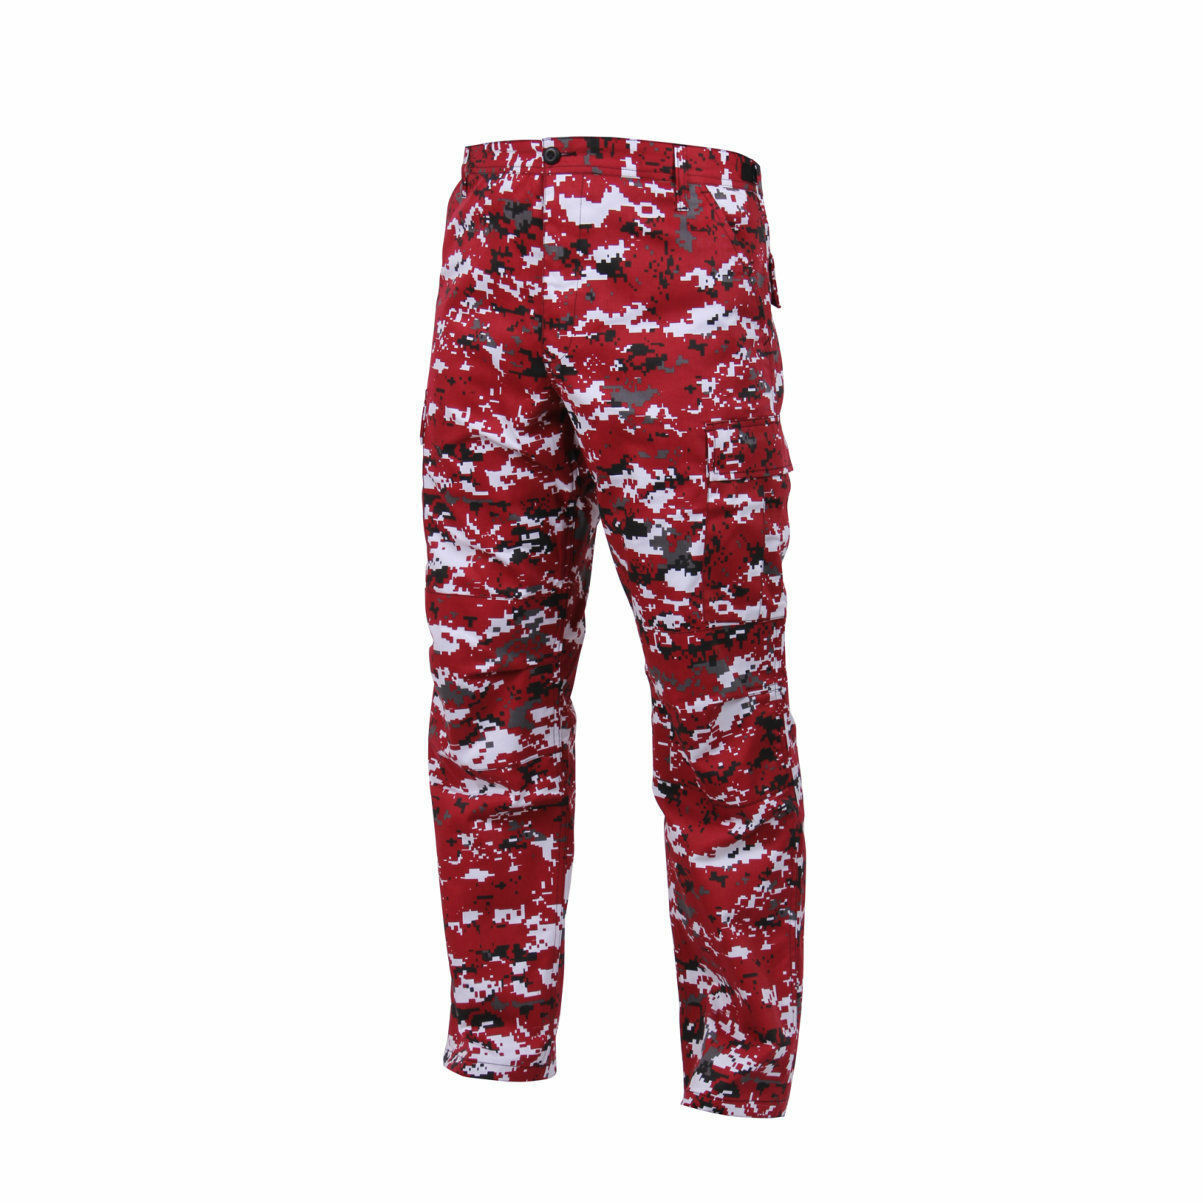 redHCO MENS RED DIGITAL CAMO BDU PANTS ARMY MILITARY FATIGUES S M L XL 2X 3X,